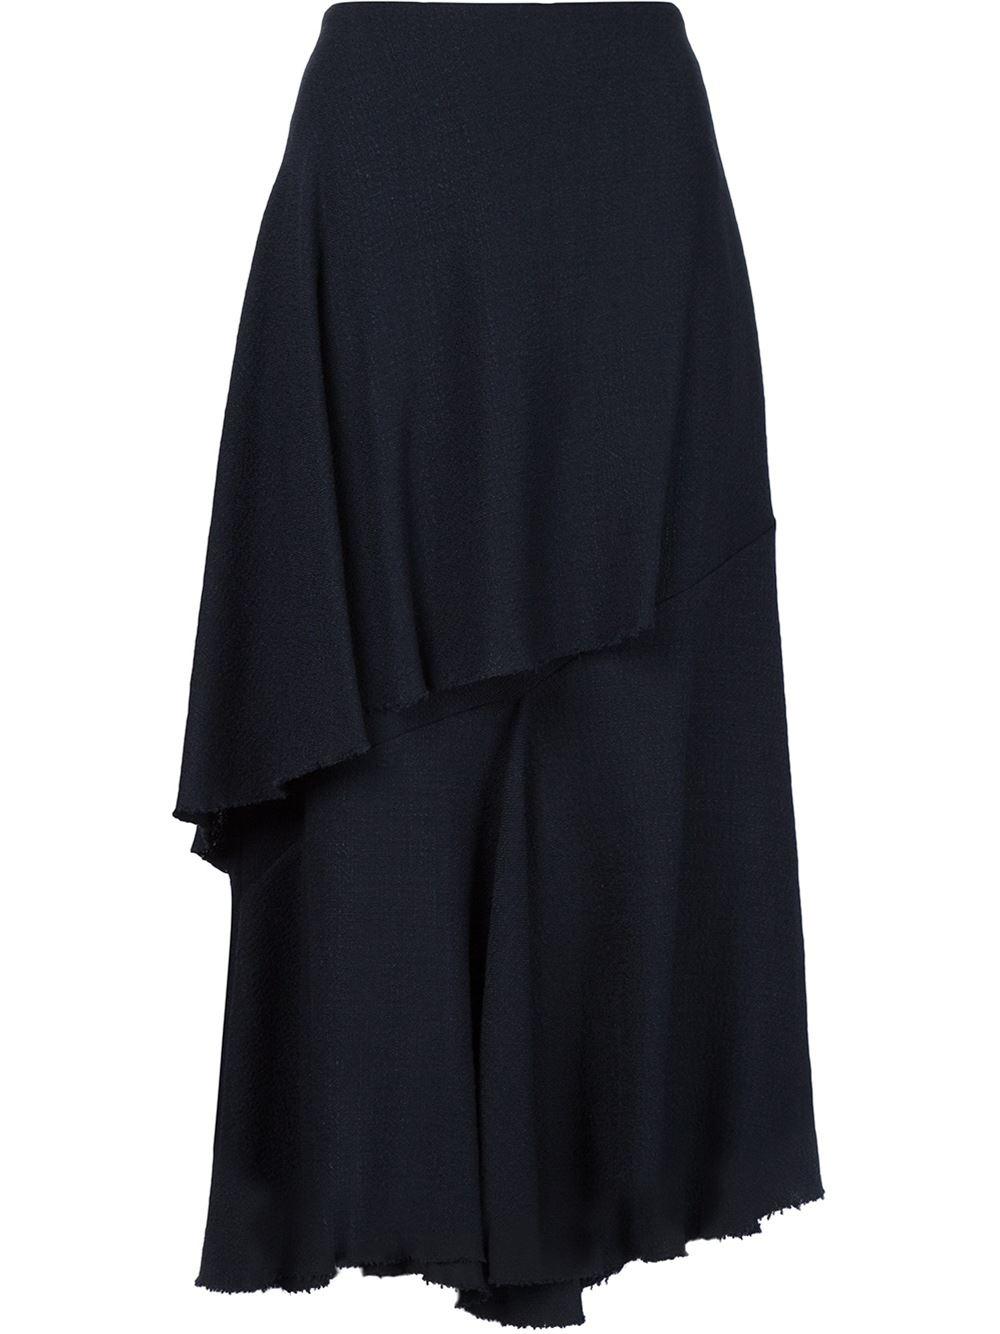 marni asymmetric ruffle midi skirt in black lyst